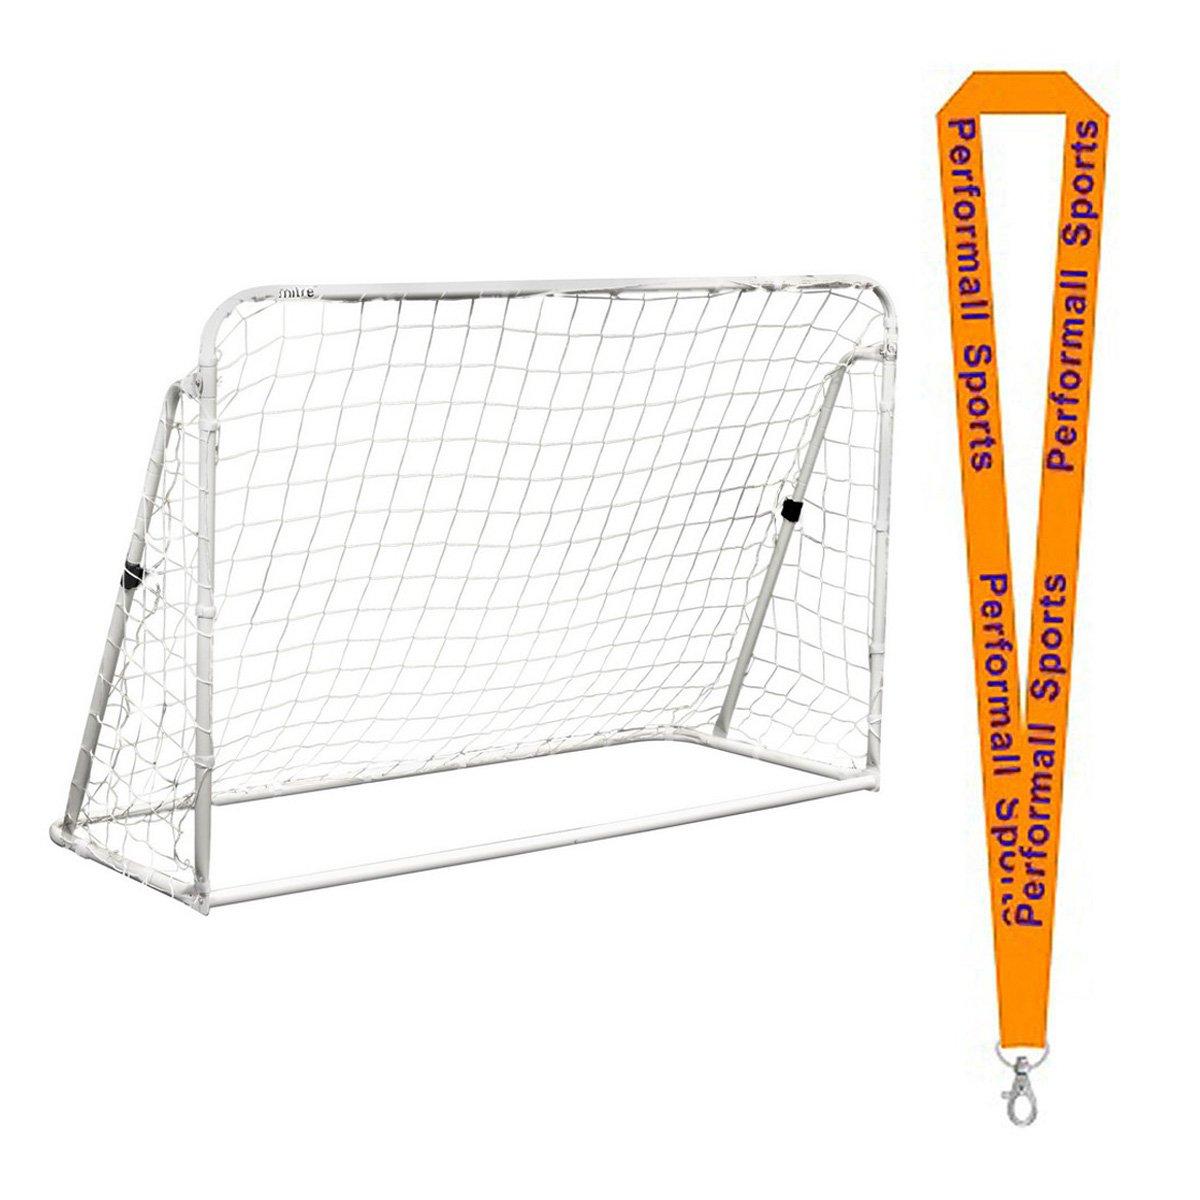 ChampionスポーツトレーナーSoccer Goal 3 in 1ホワイトwith 1 performall Lanyard sg3in1 – 1p B01FSZ762Q